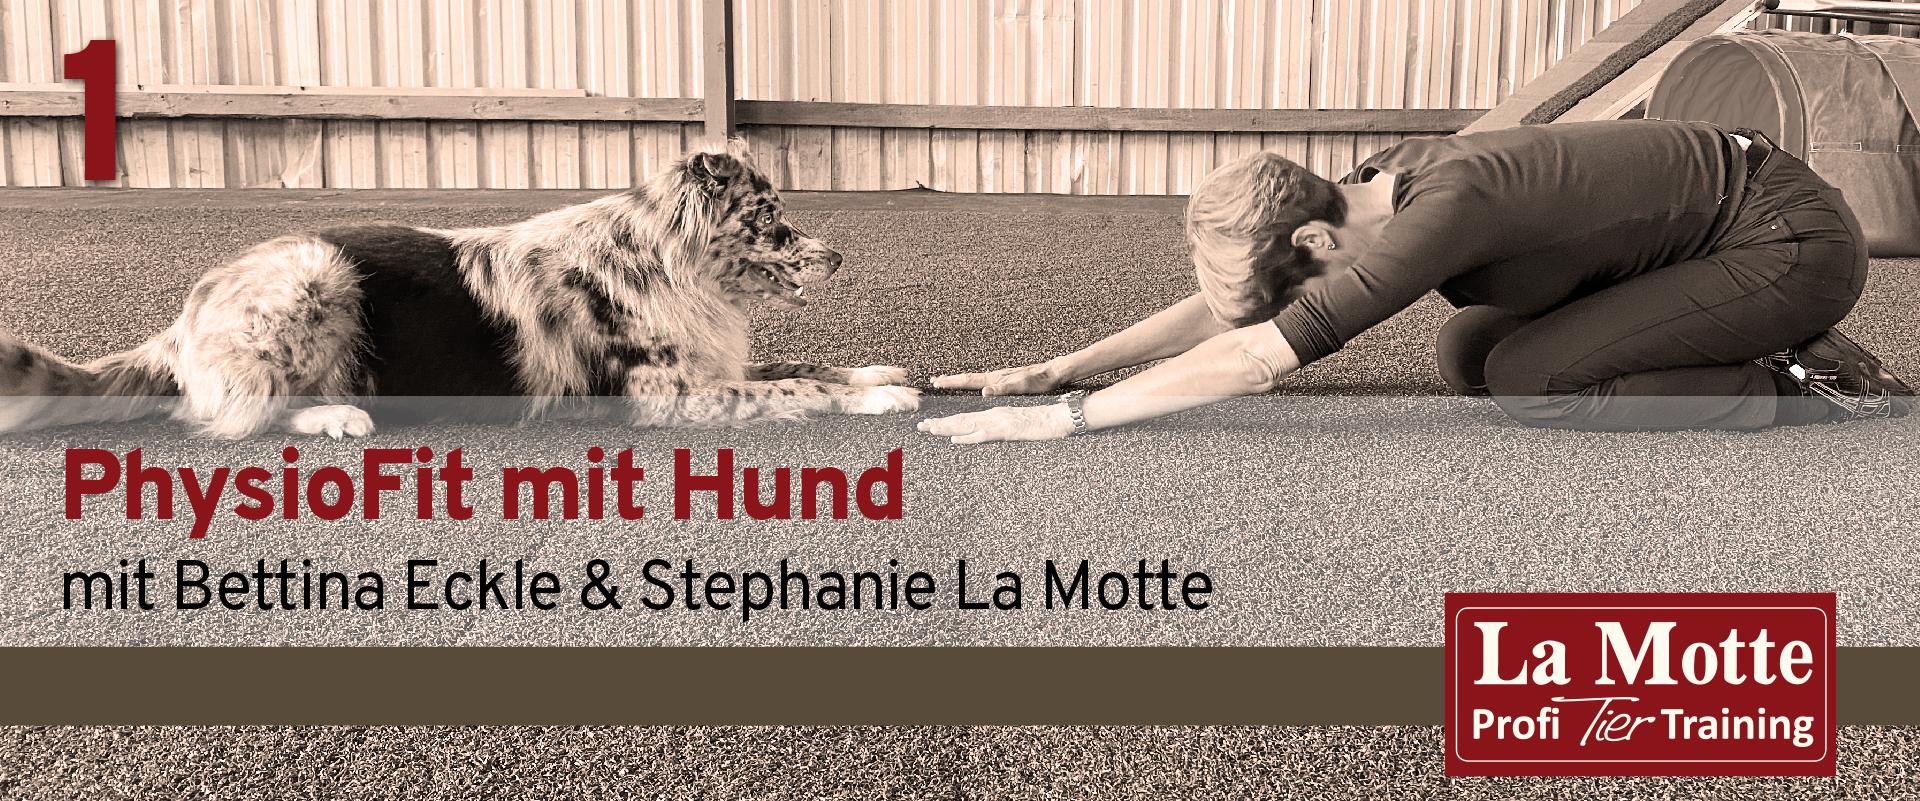 PhysioFit mit Hund mit Bettina Ecke & Stephanie La Motte - Teil 1